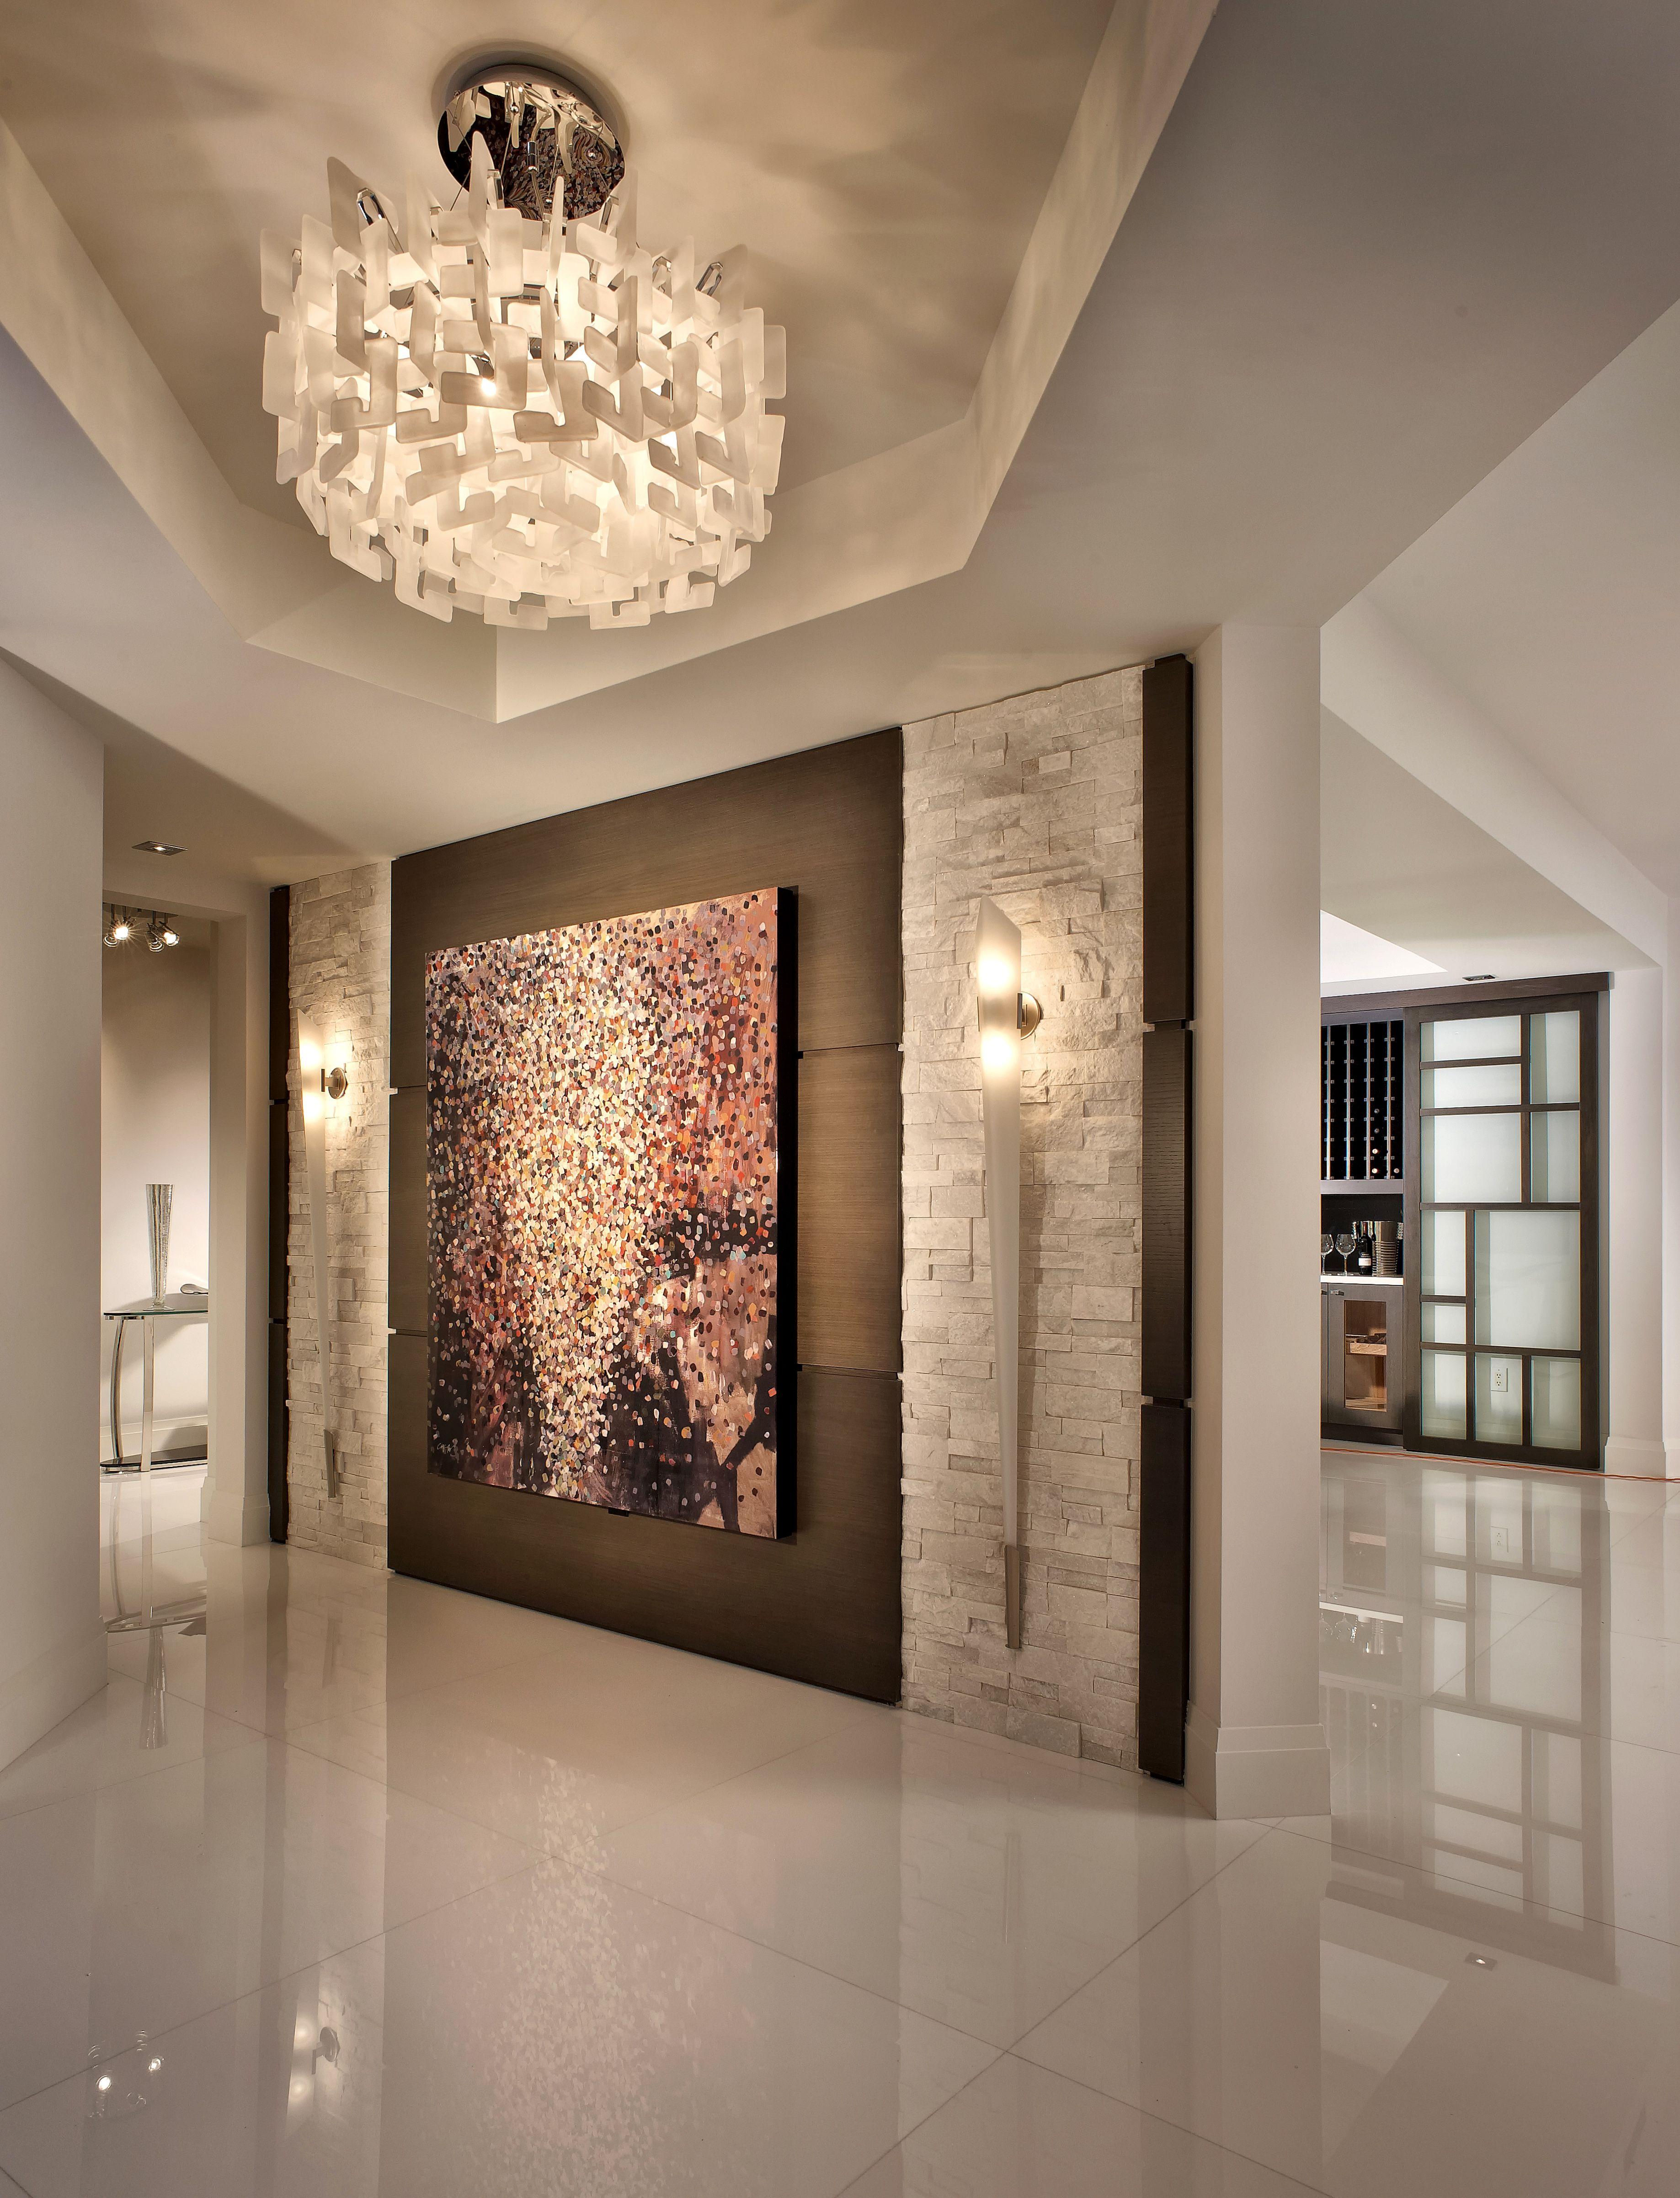 Murano gl floor lamp murano gl floor lamps 173 for at 1stdibs - Murano Gl Floor Lamp Murano Gl Floor Lamps 173 For At 1stdibs 59